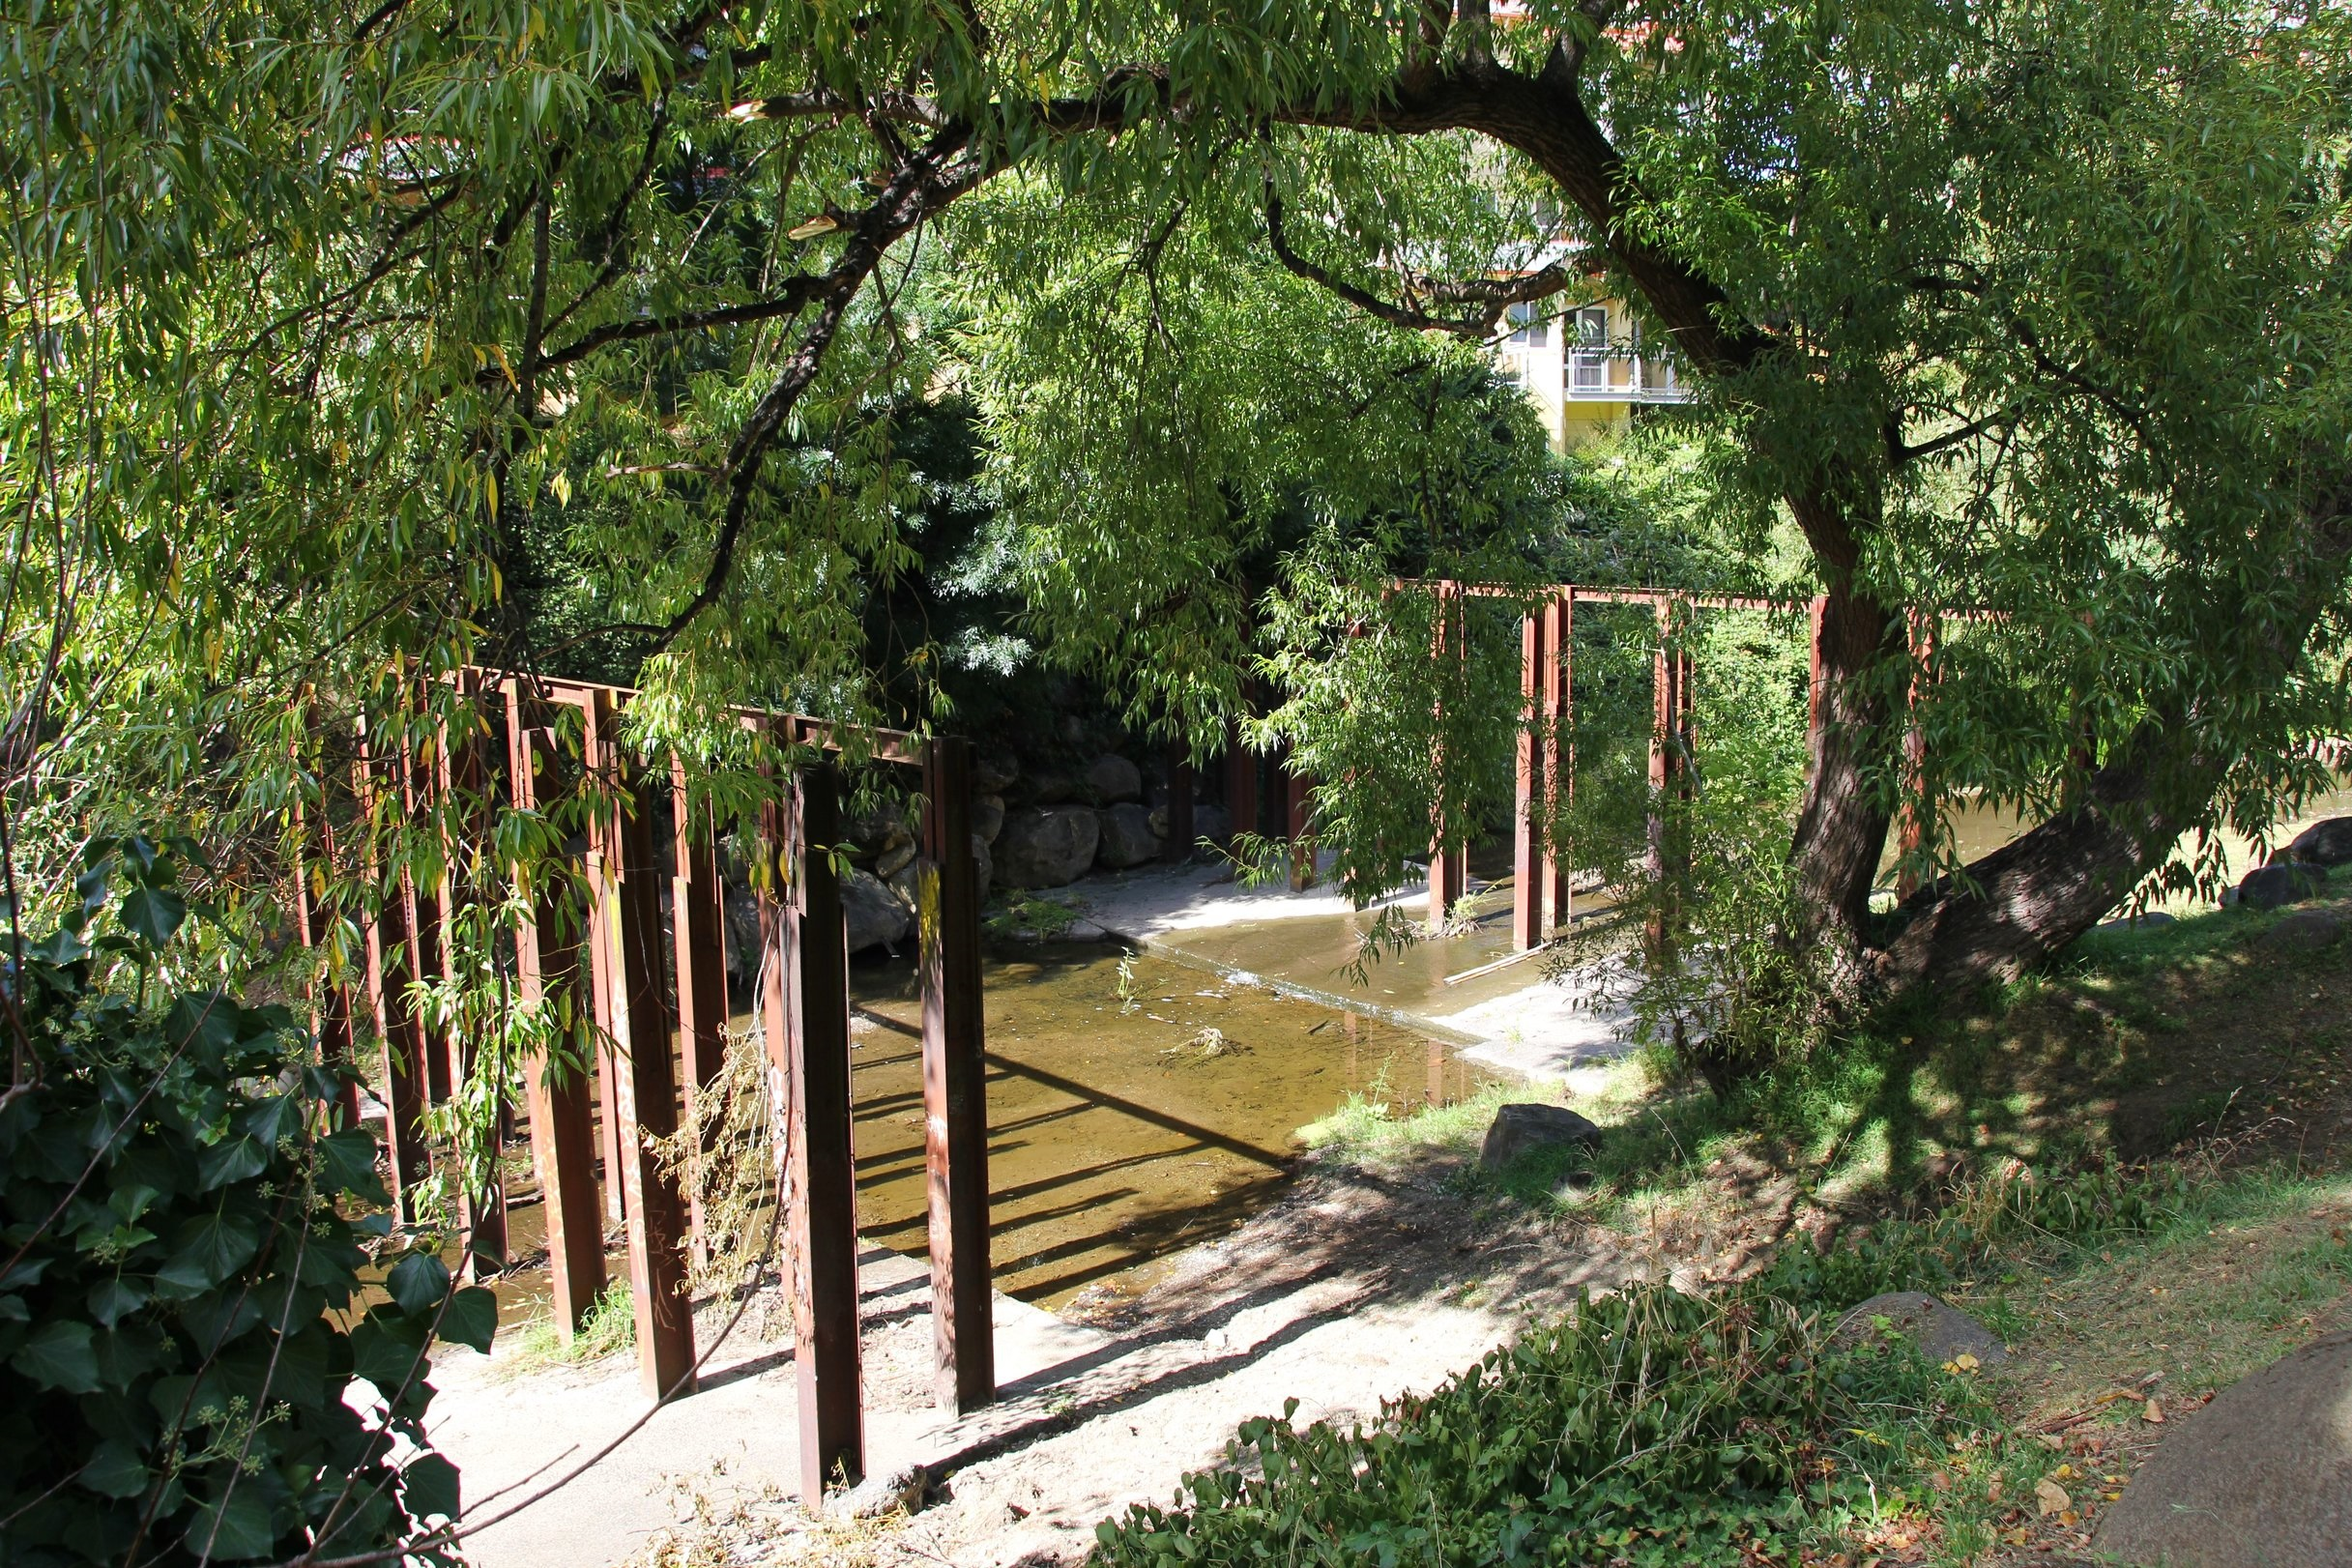 flood mitigation structures